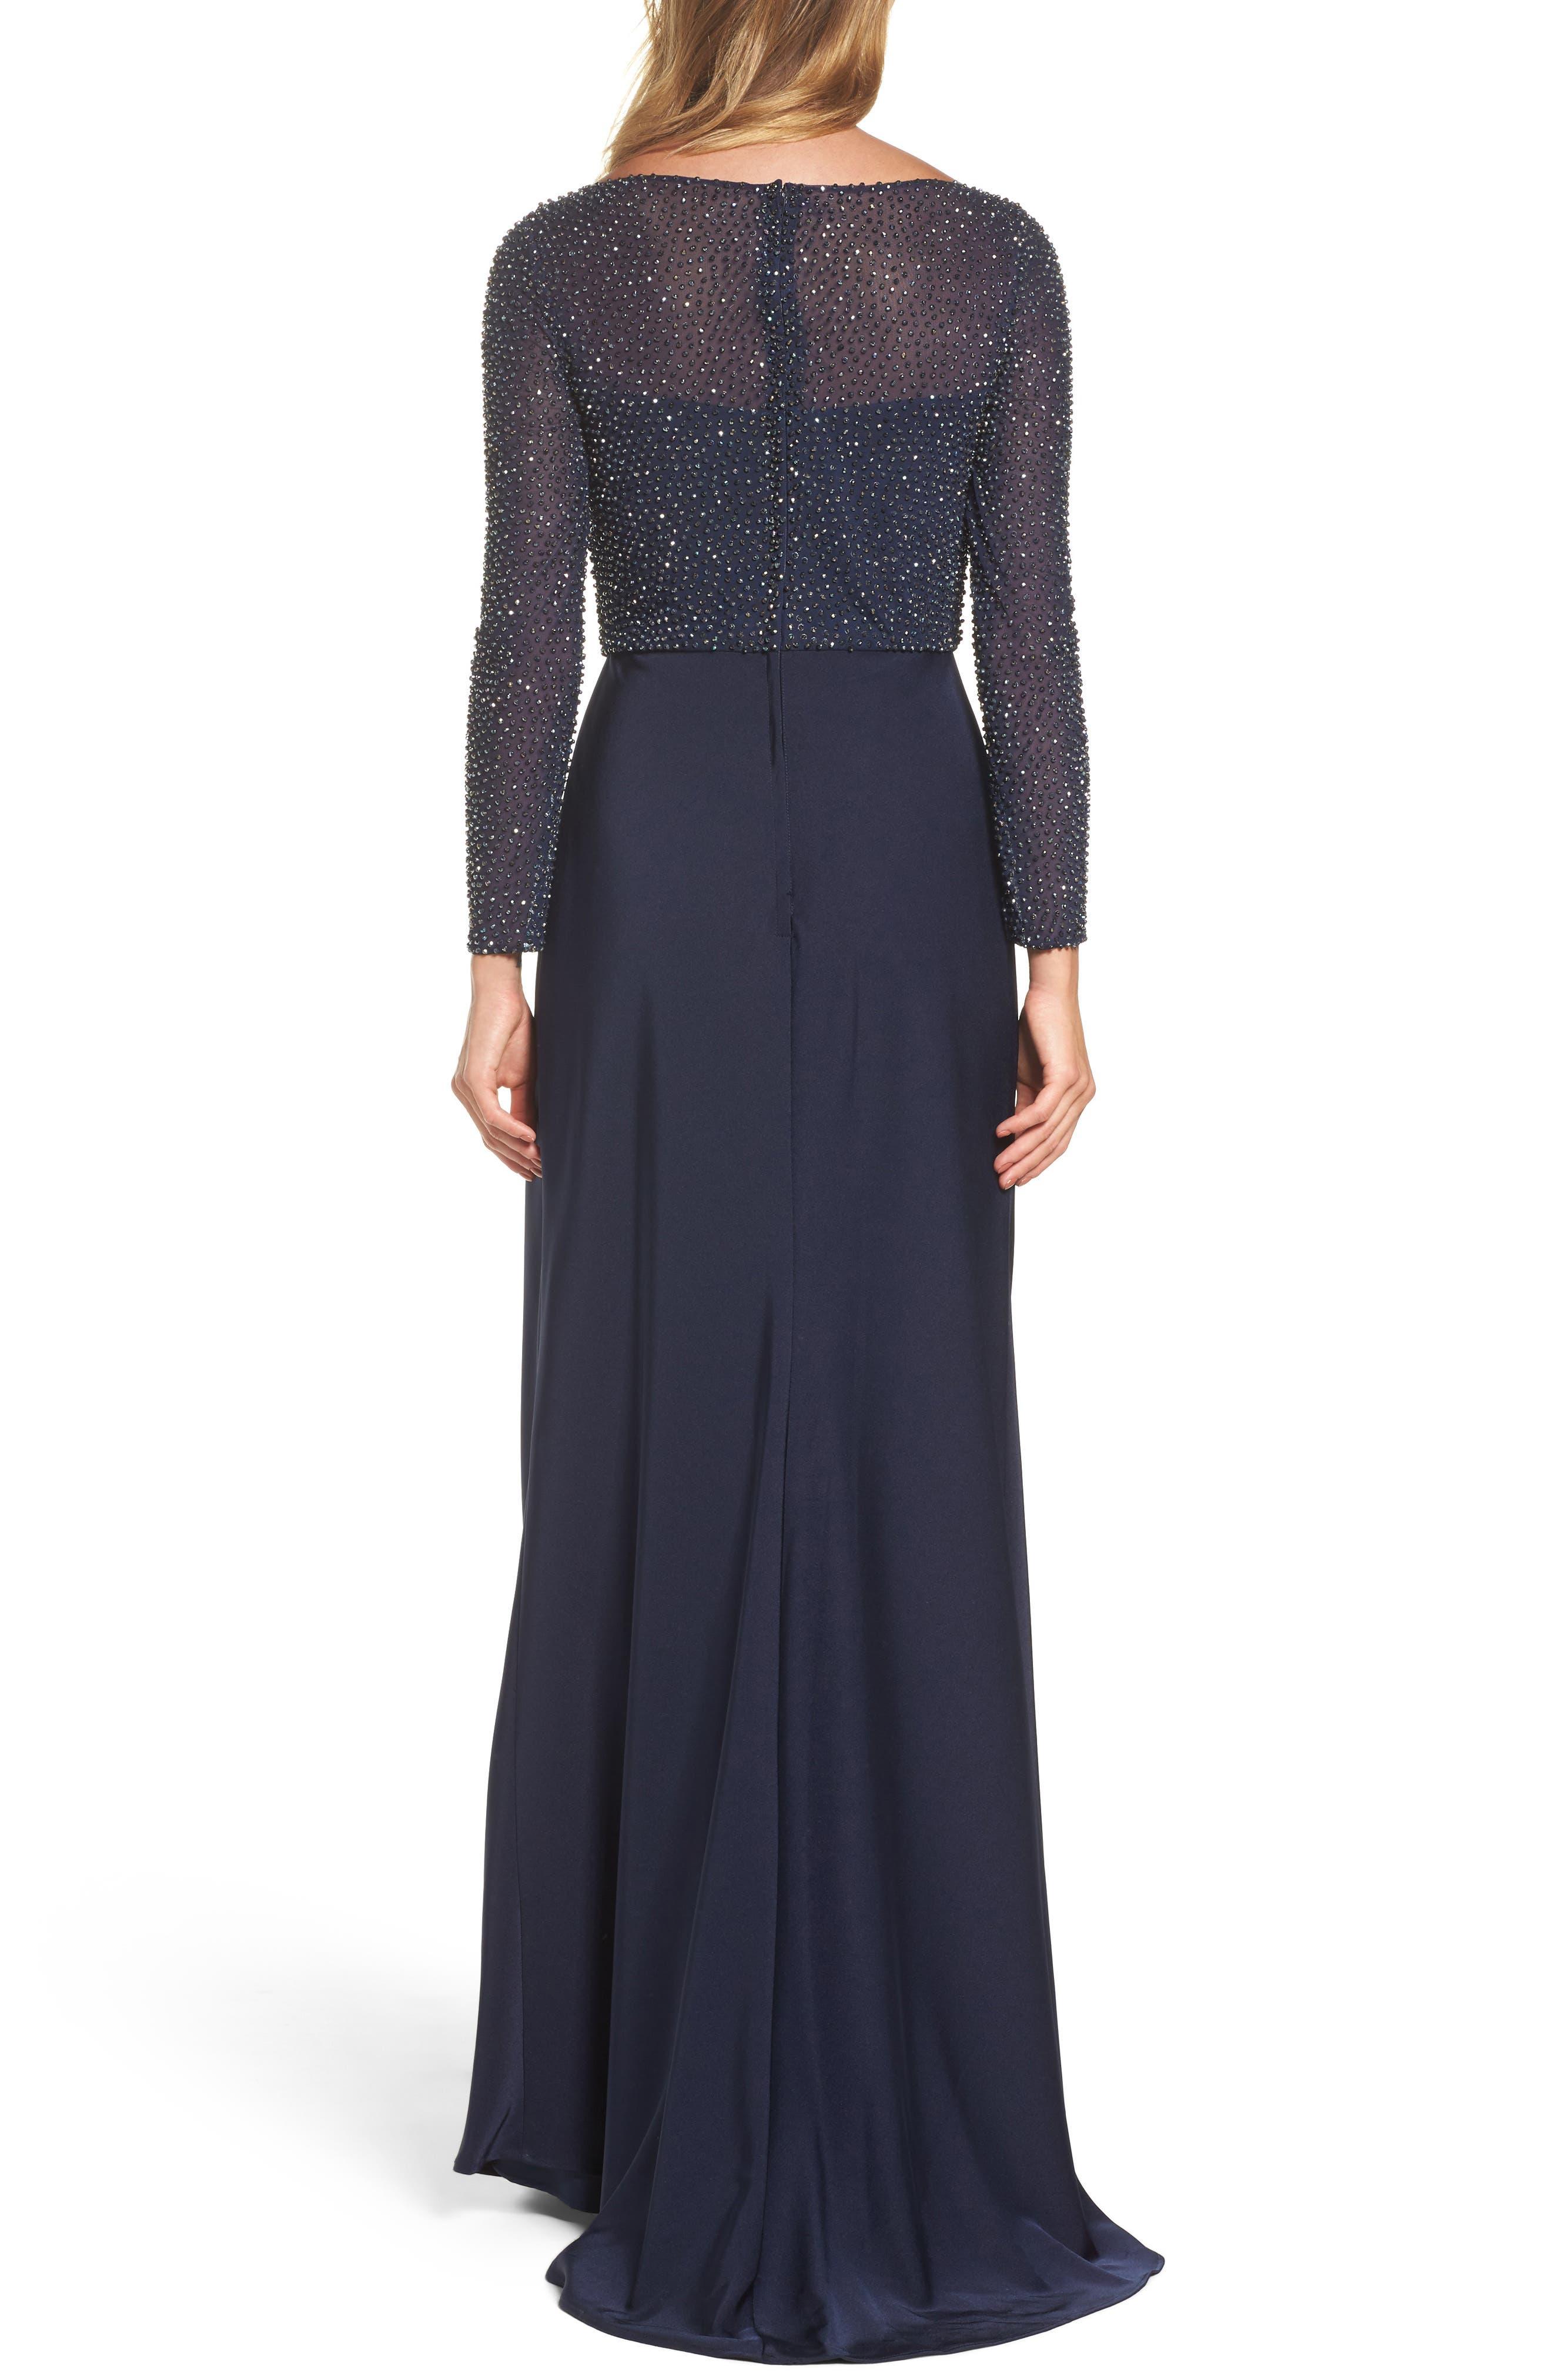 LA FEMME, Bead Embellished Gown, Alternate thumbnail 2, color, NAVY